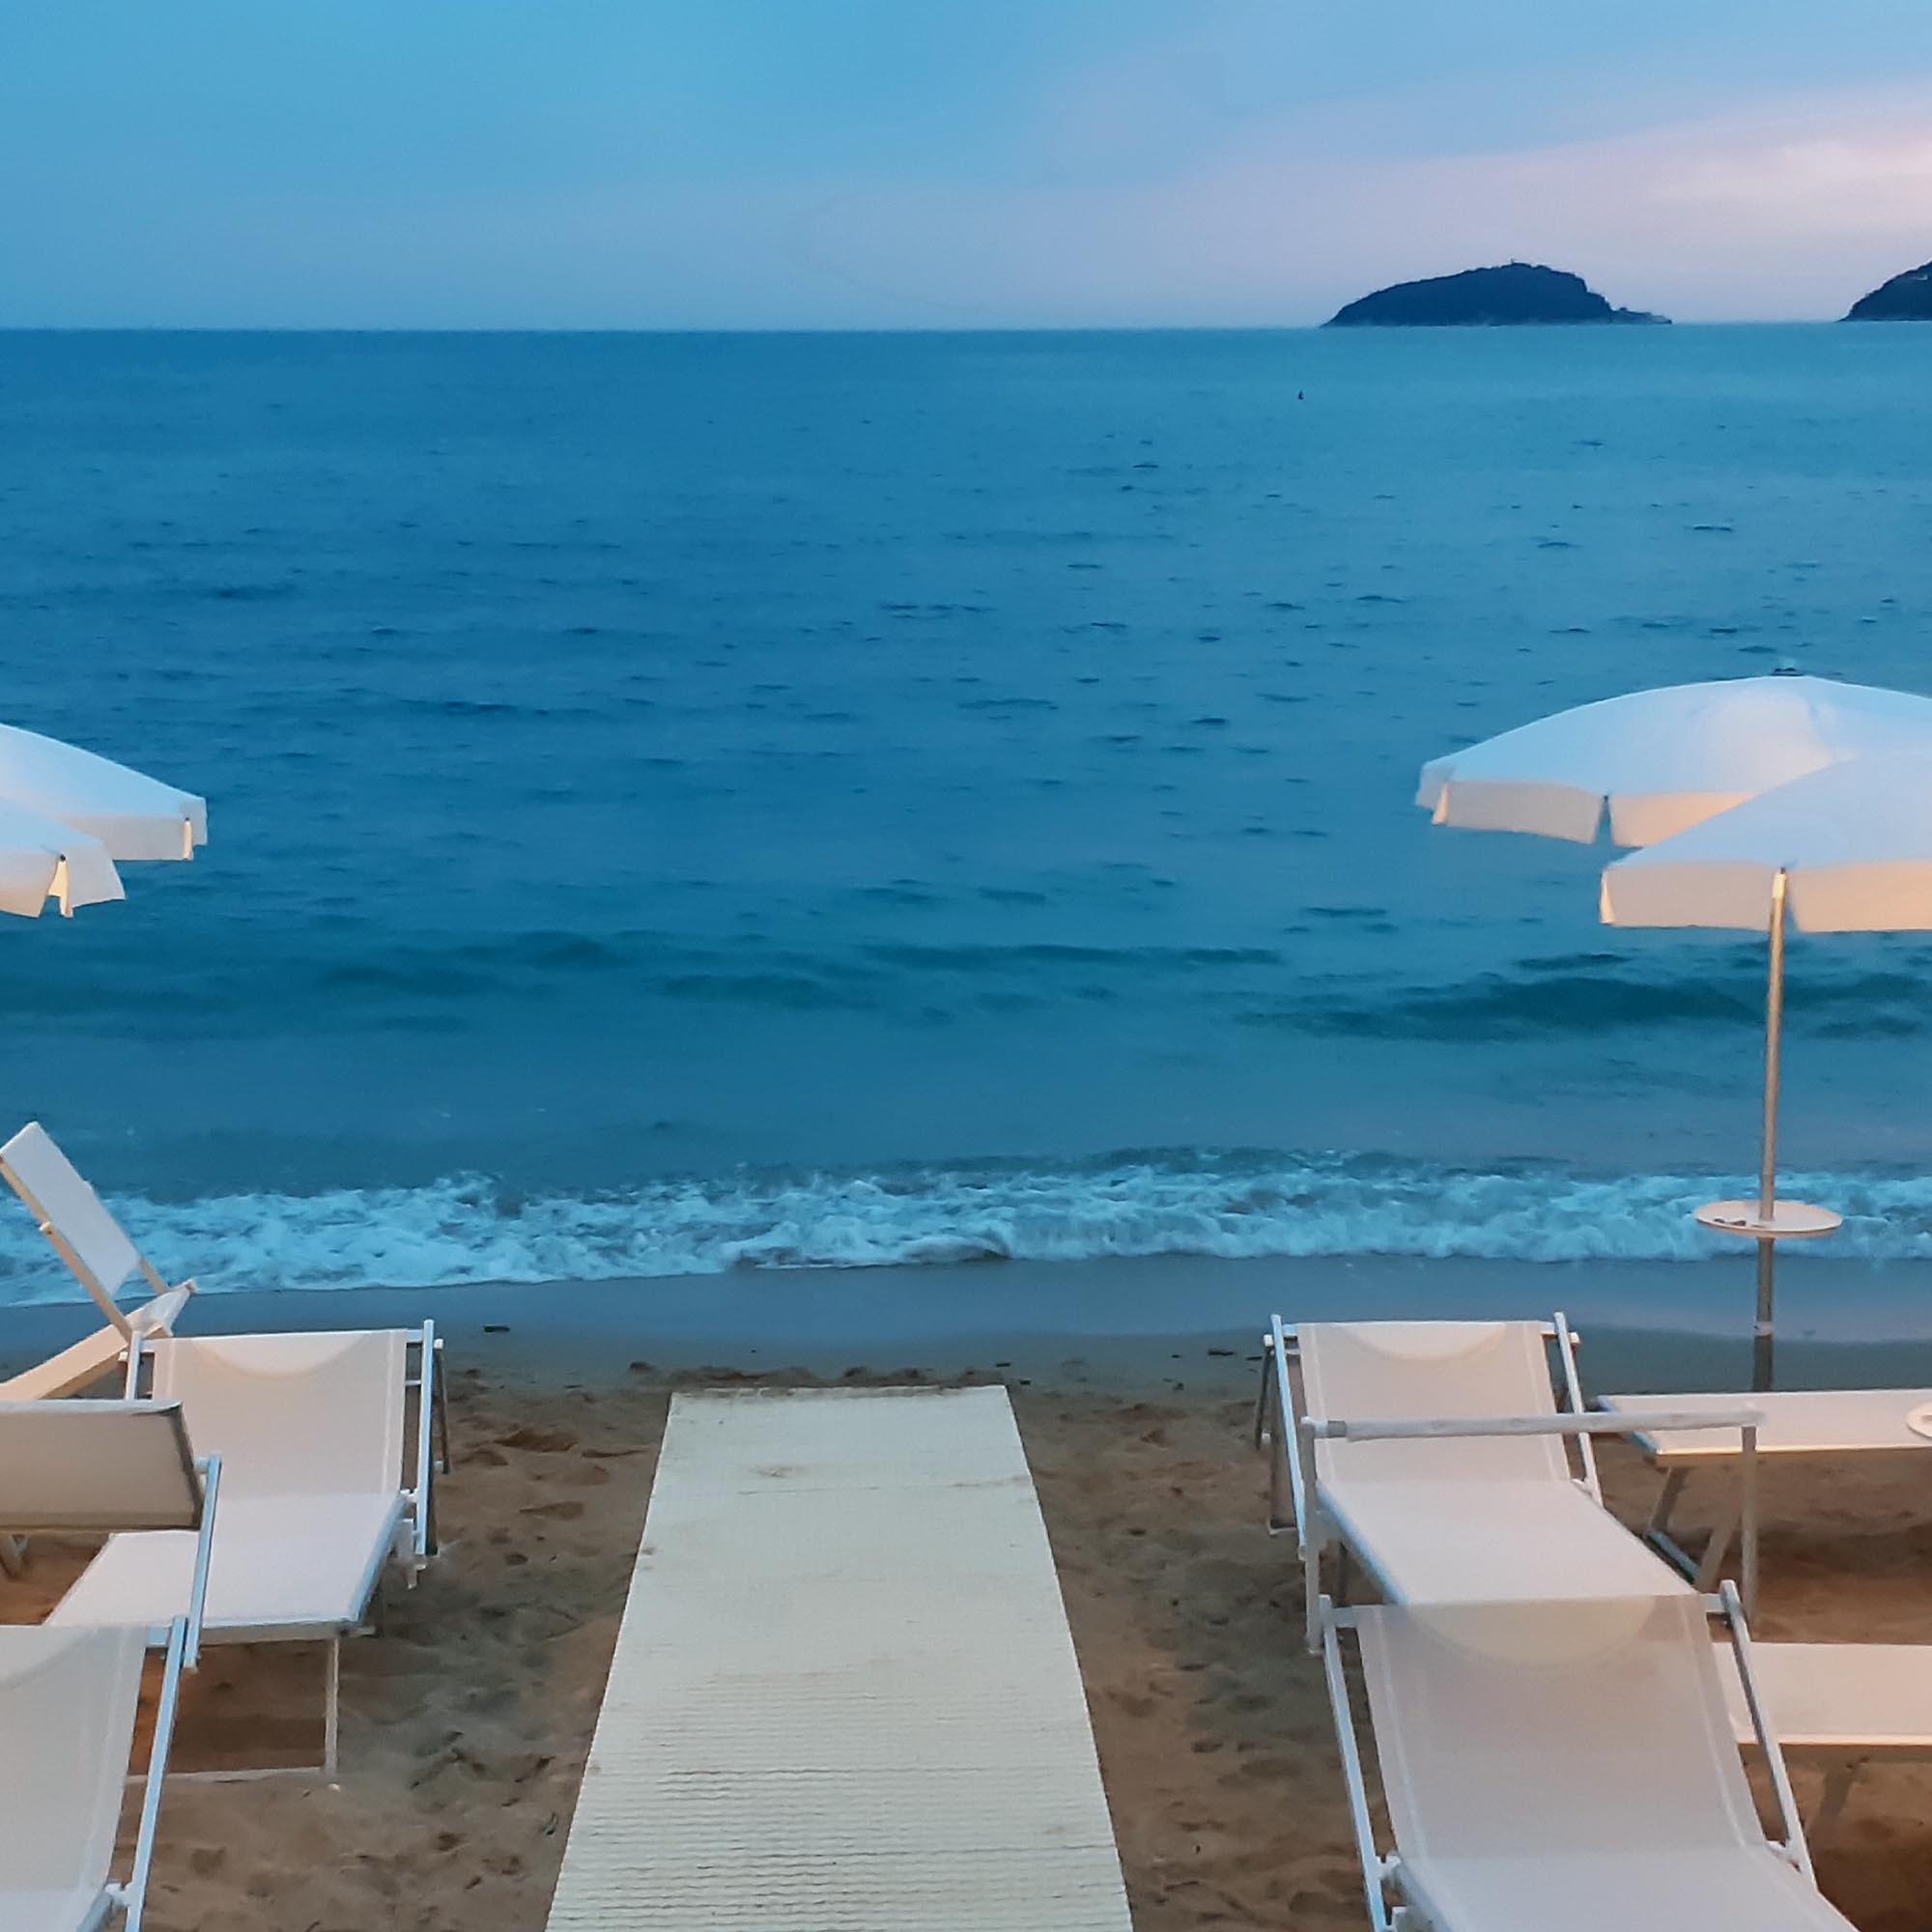 Calabianca beach - Baia blu